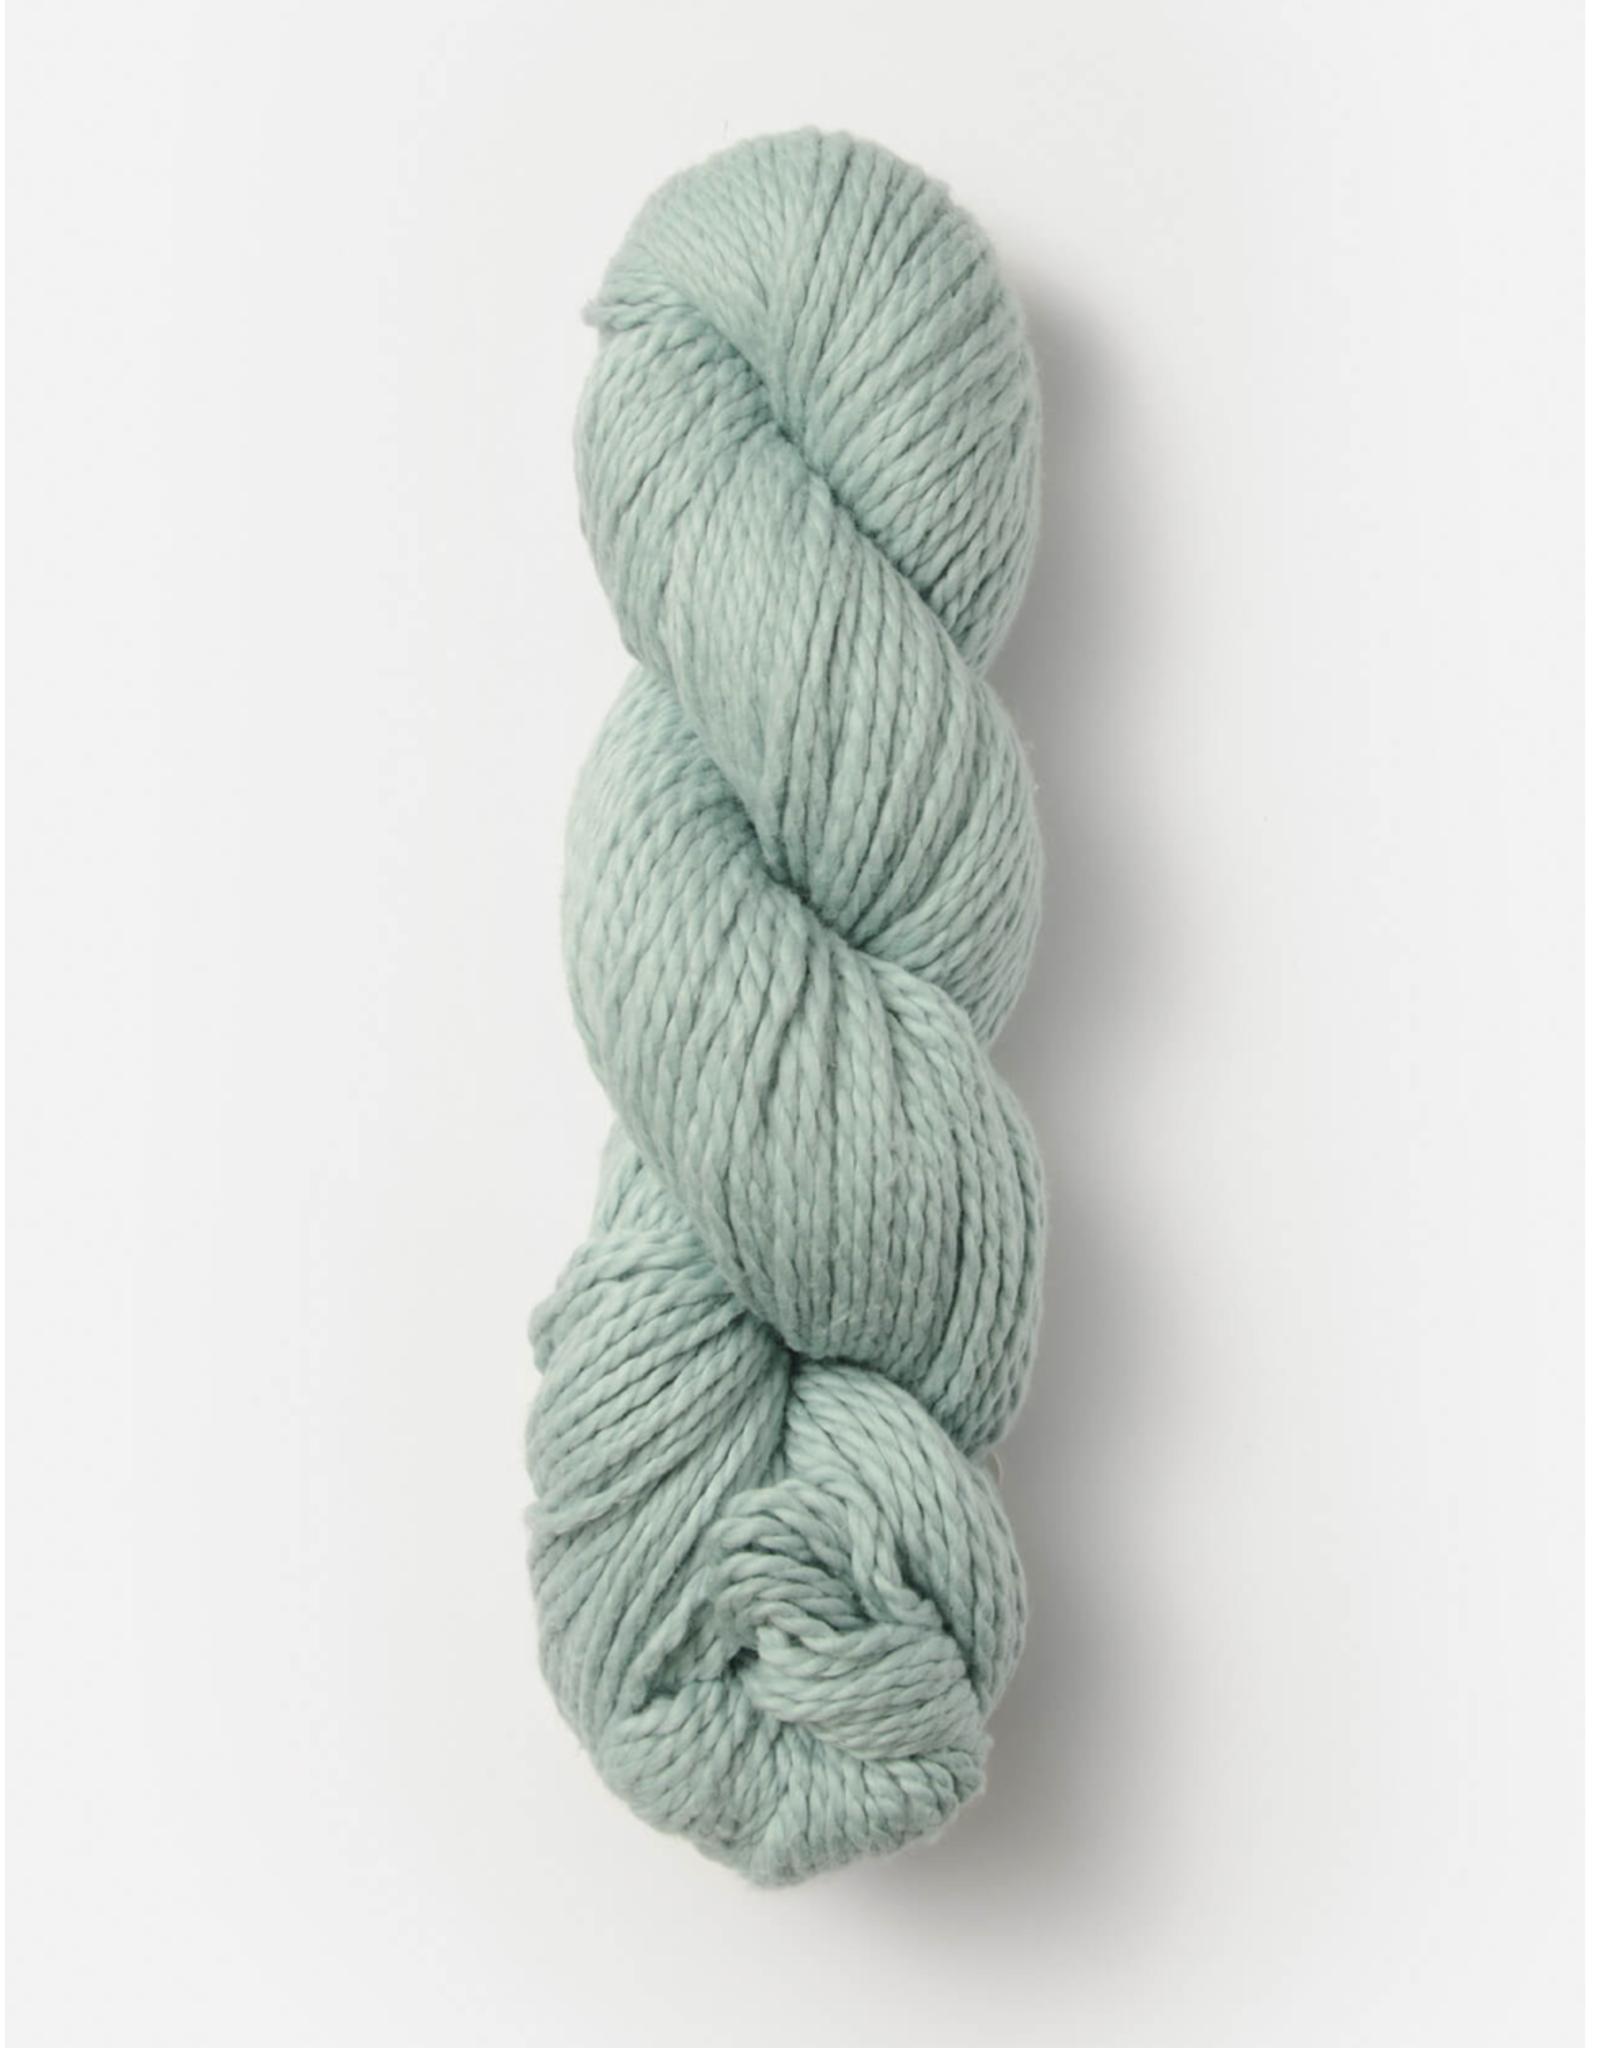 Blue Sky Alpacas Blue Sky Fibers Organic Cotton - Worsted